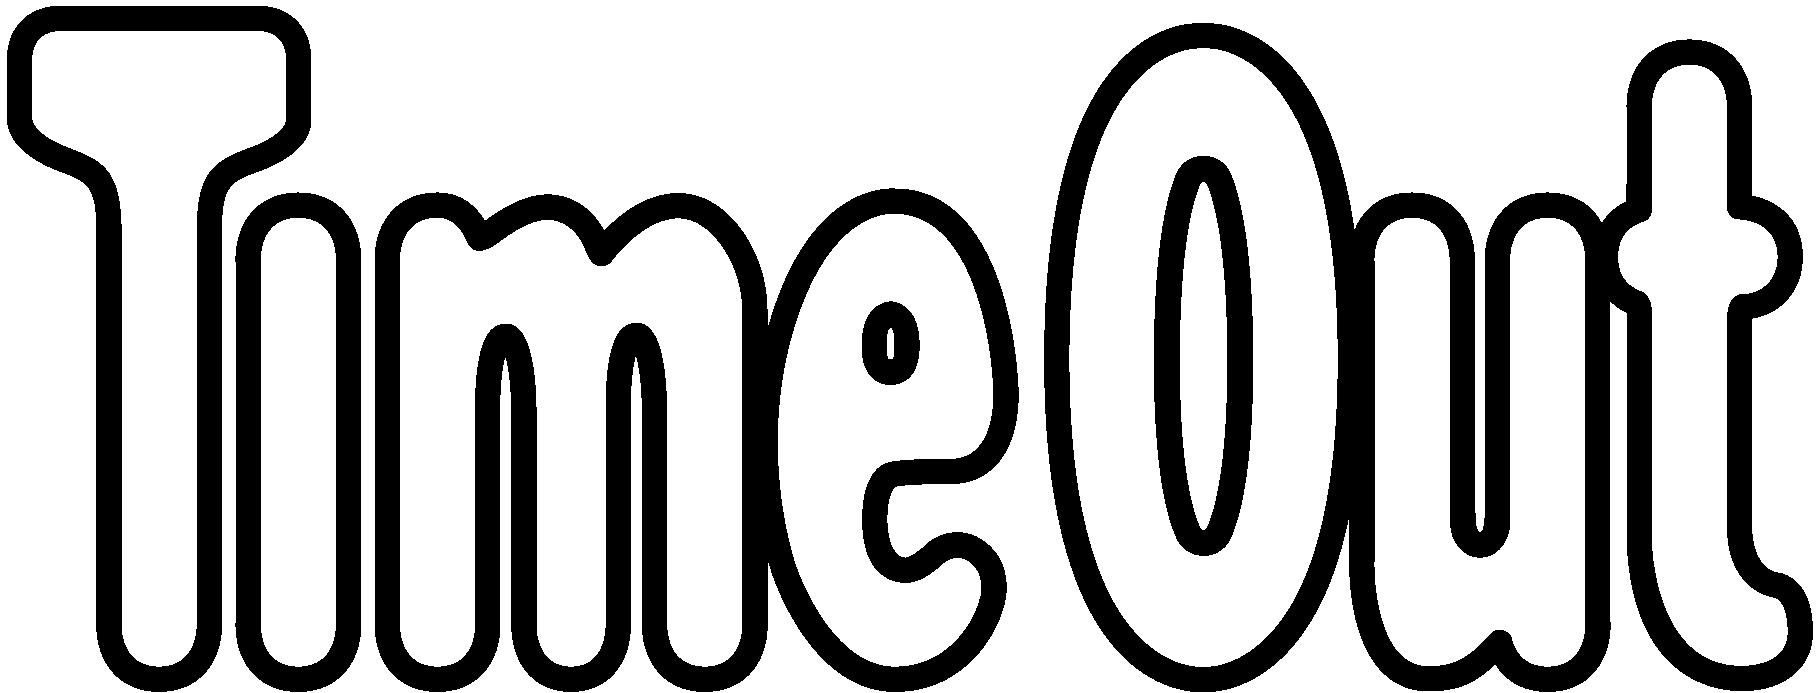 TimeOut London Client Logo